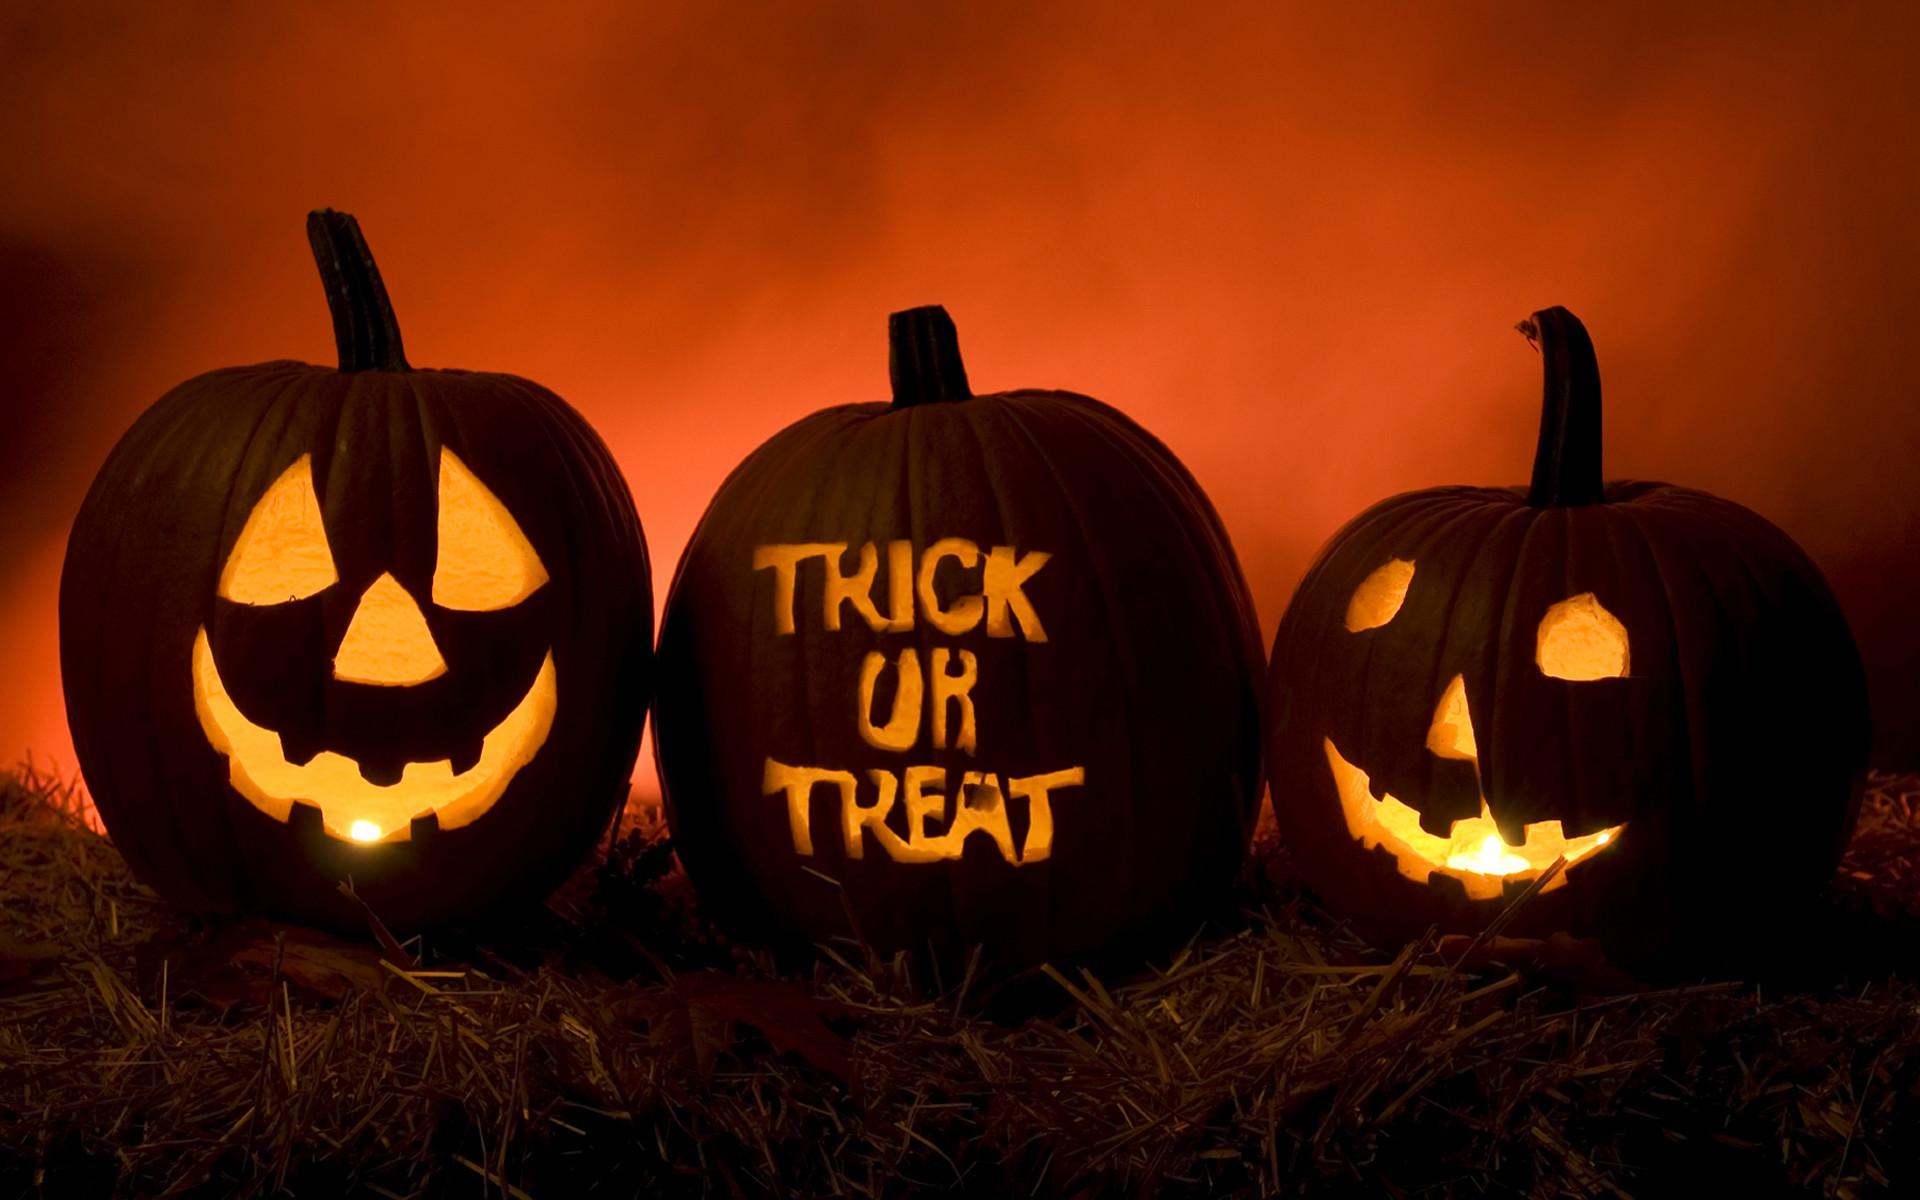 Free download halloween wallpaper pictures.